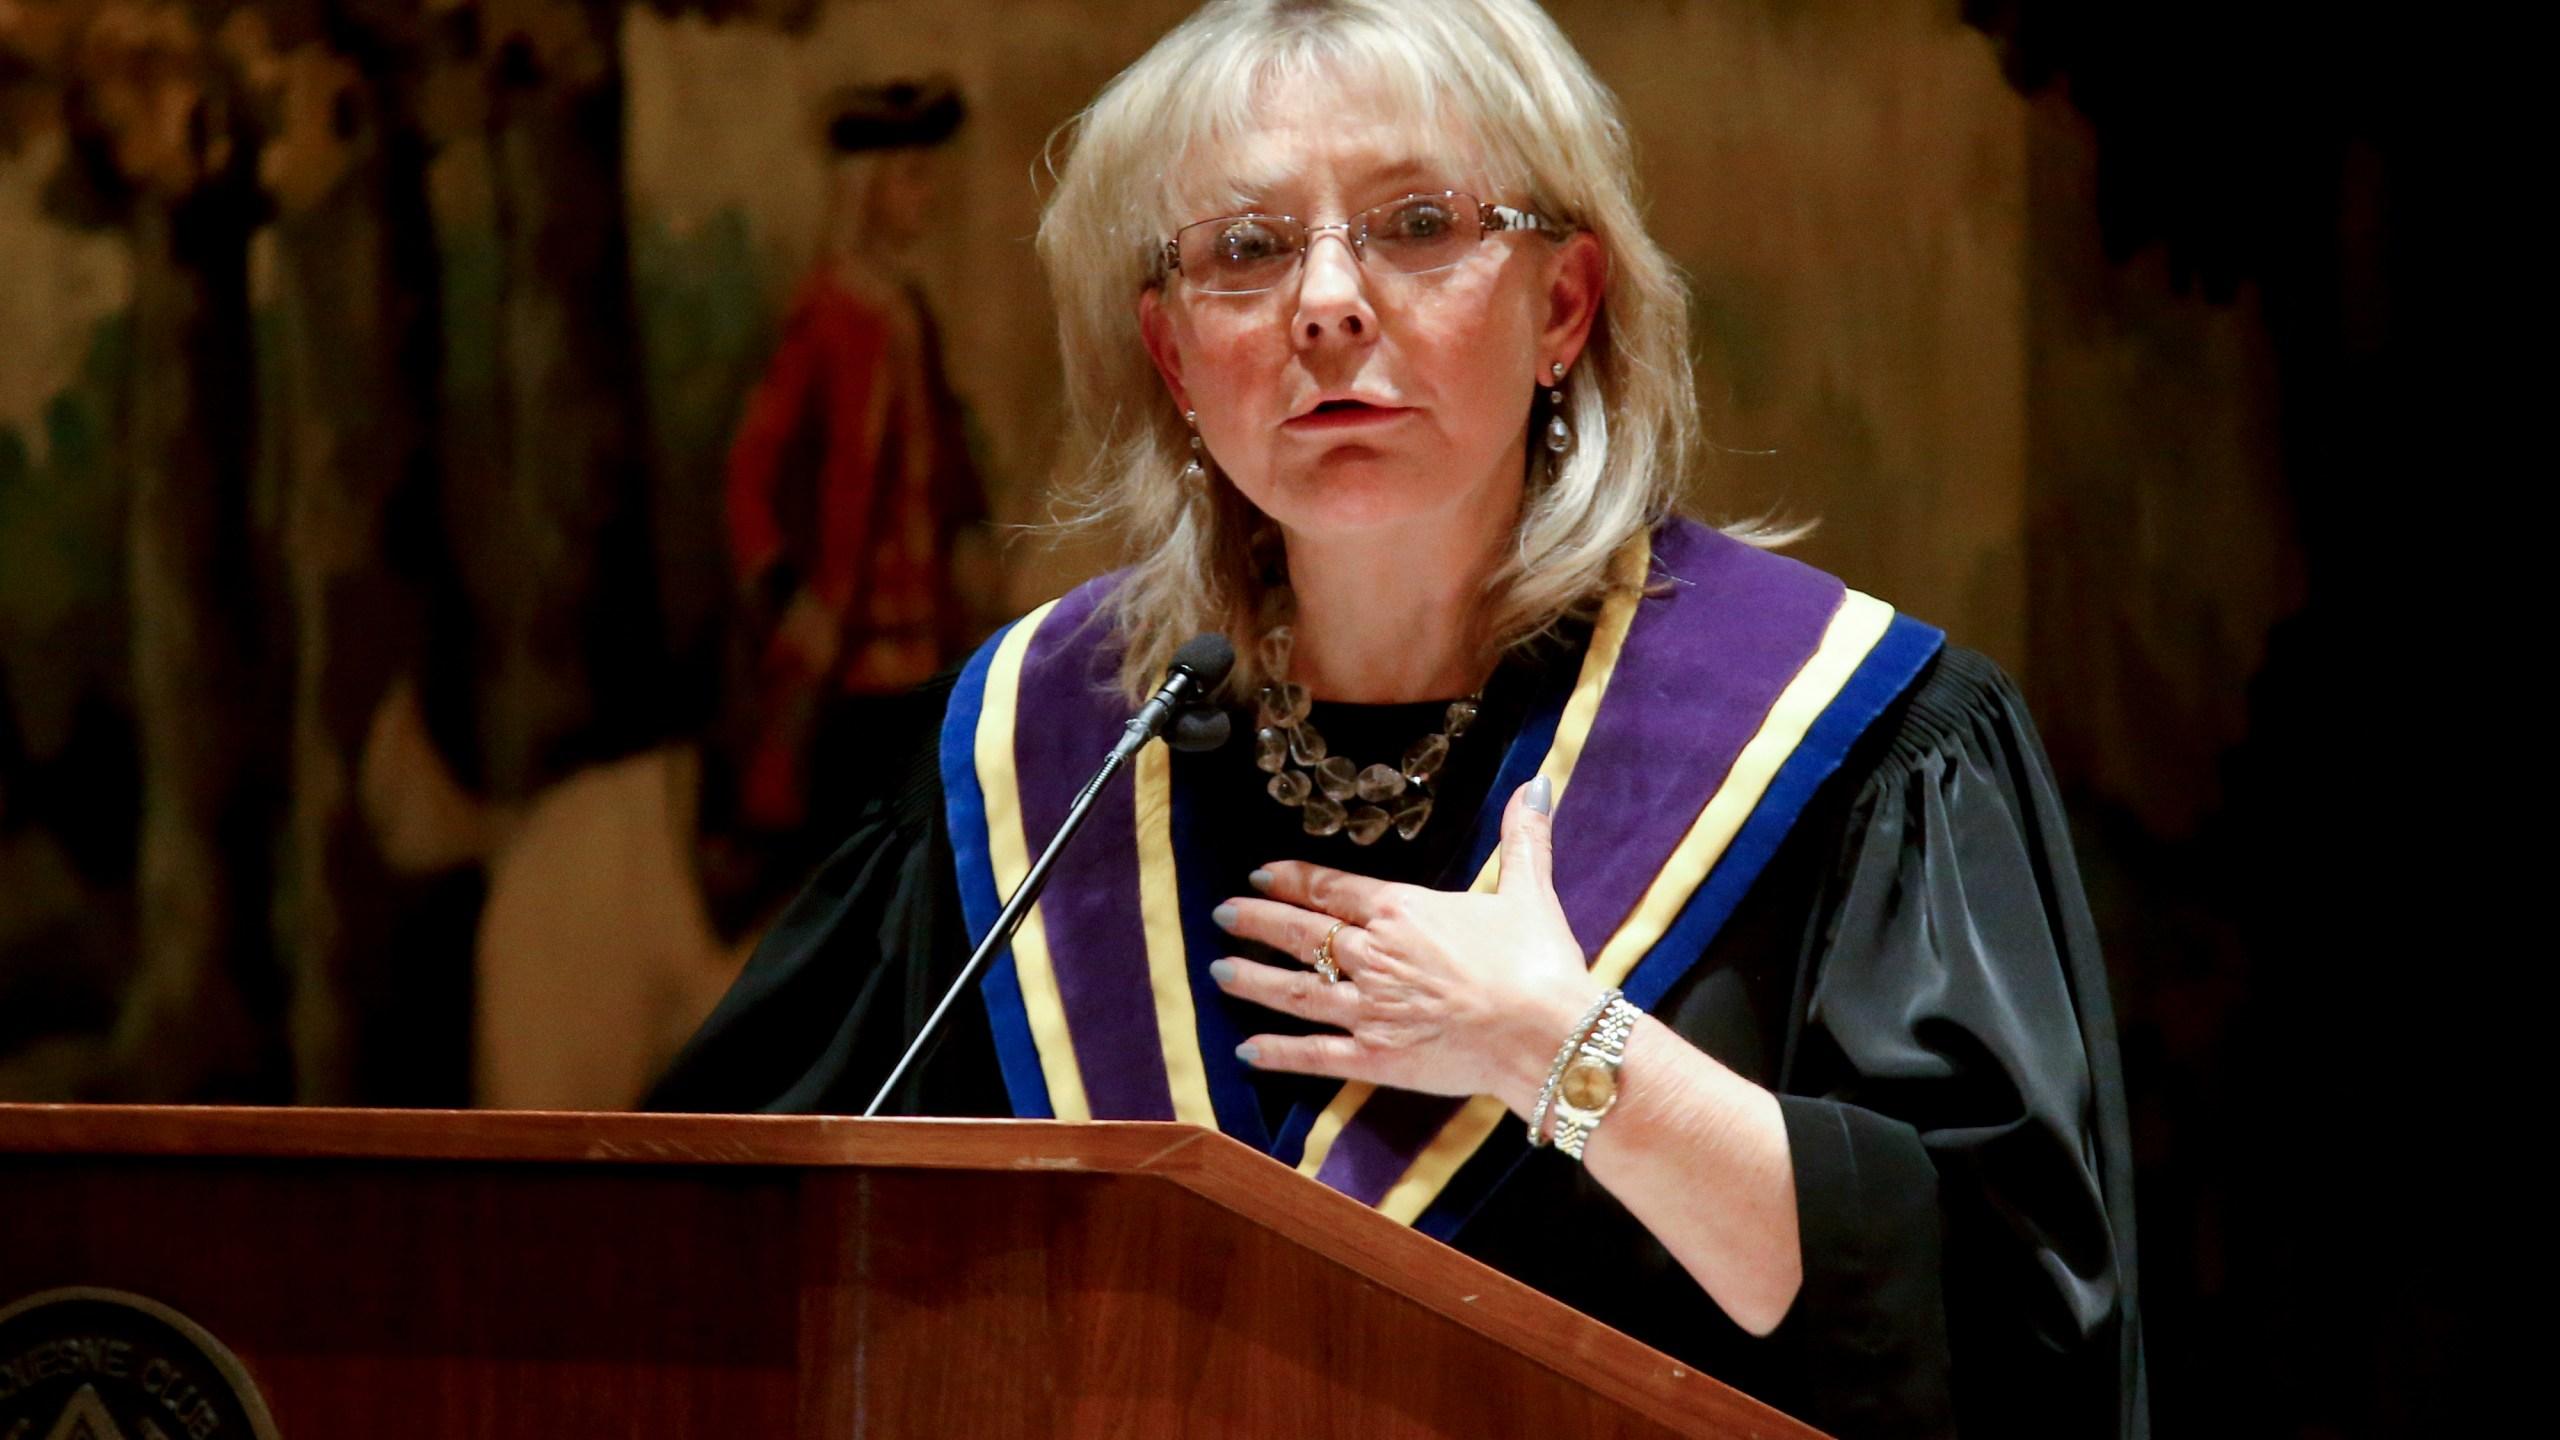 Christine L. Donohue